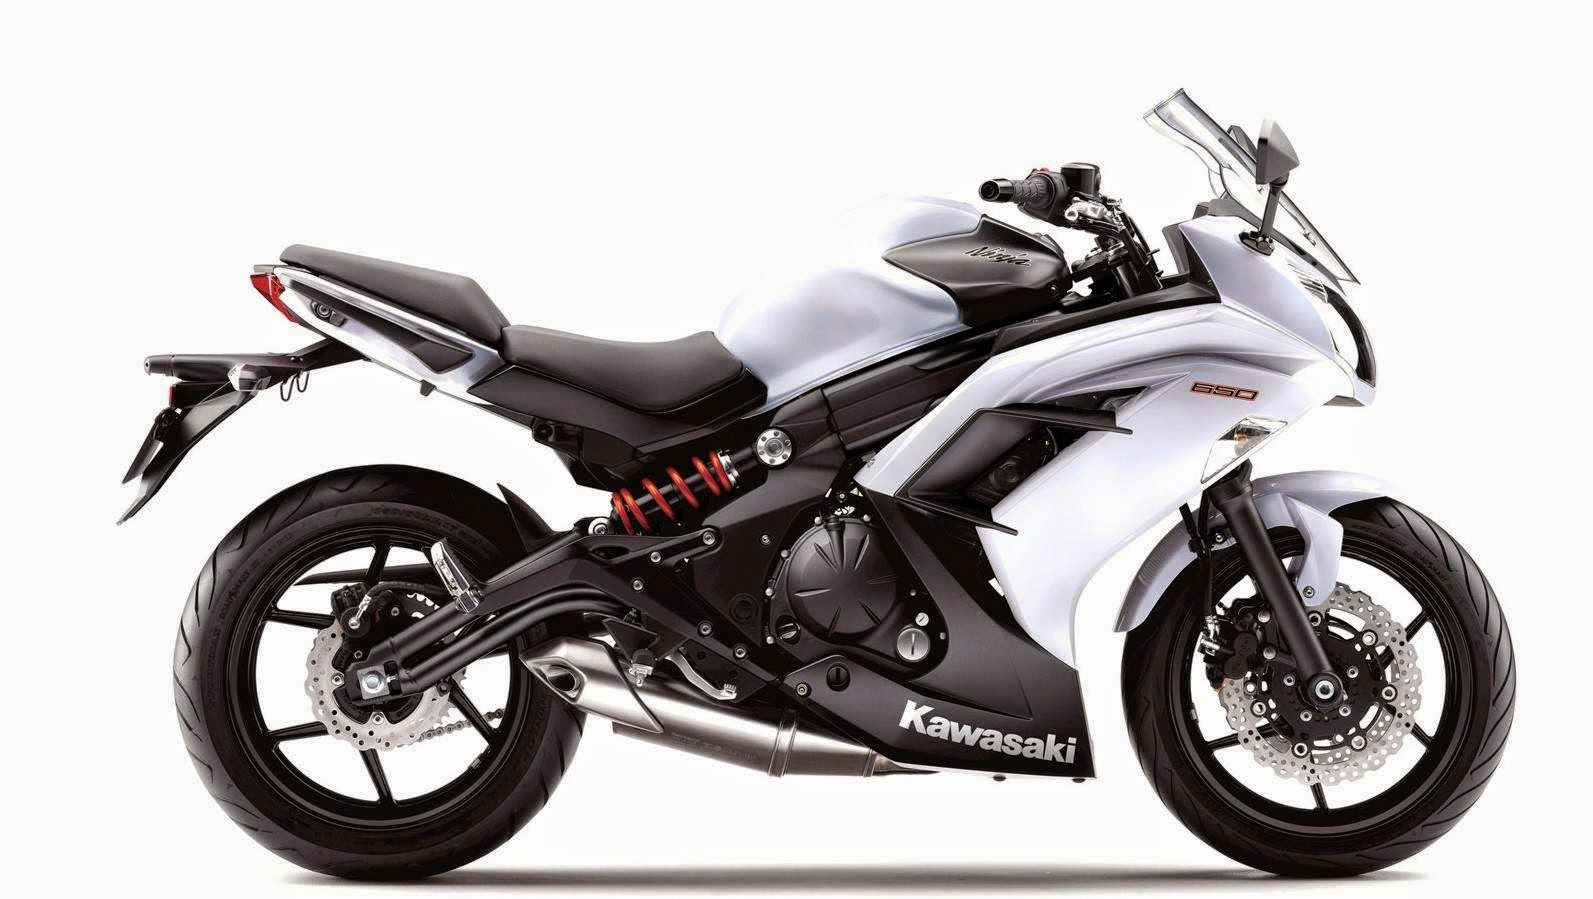 Foto Gambar Motor Kawasaki Ninja Terbaru  Foto Gambar Terbaru